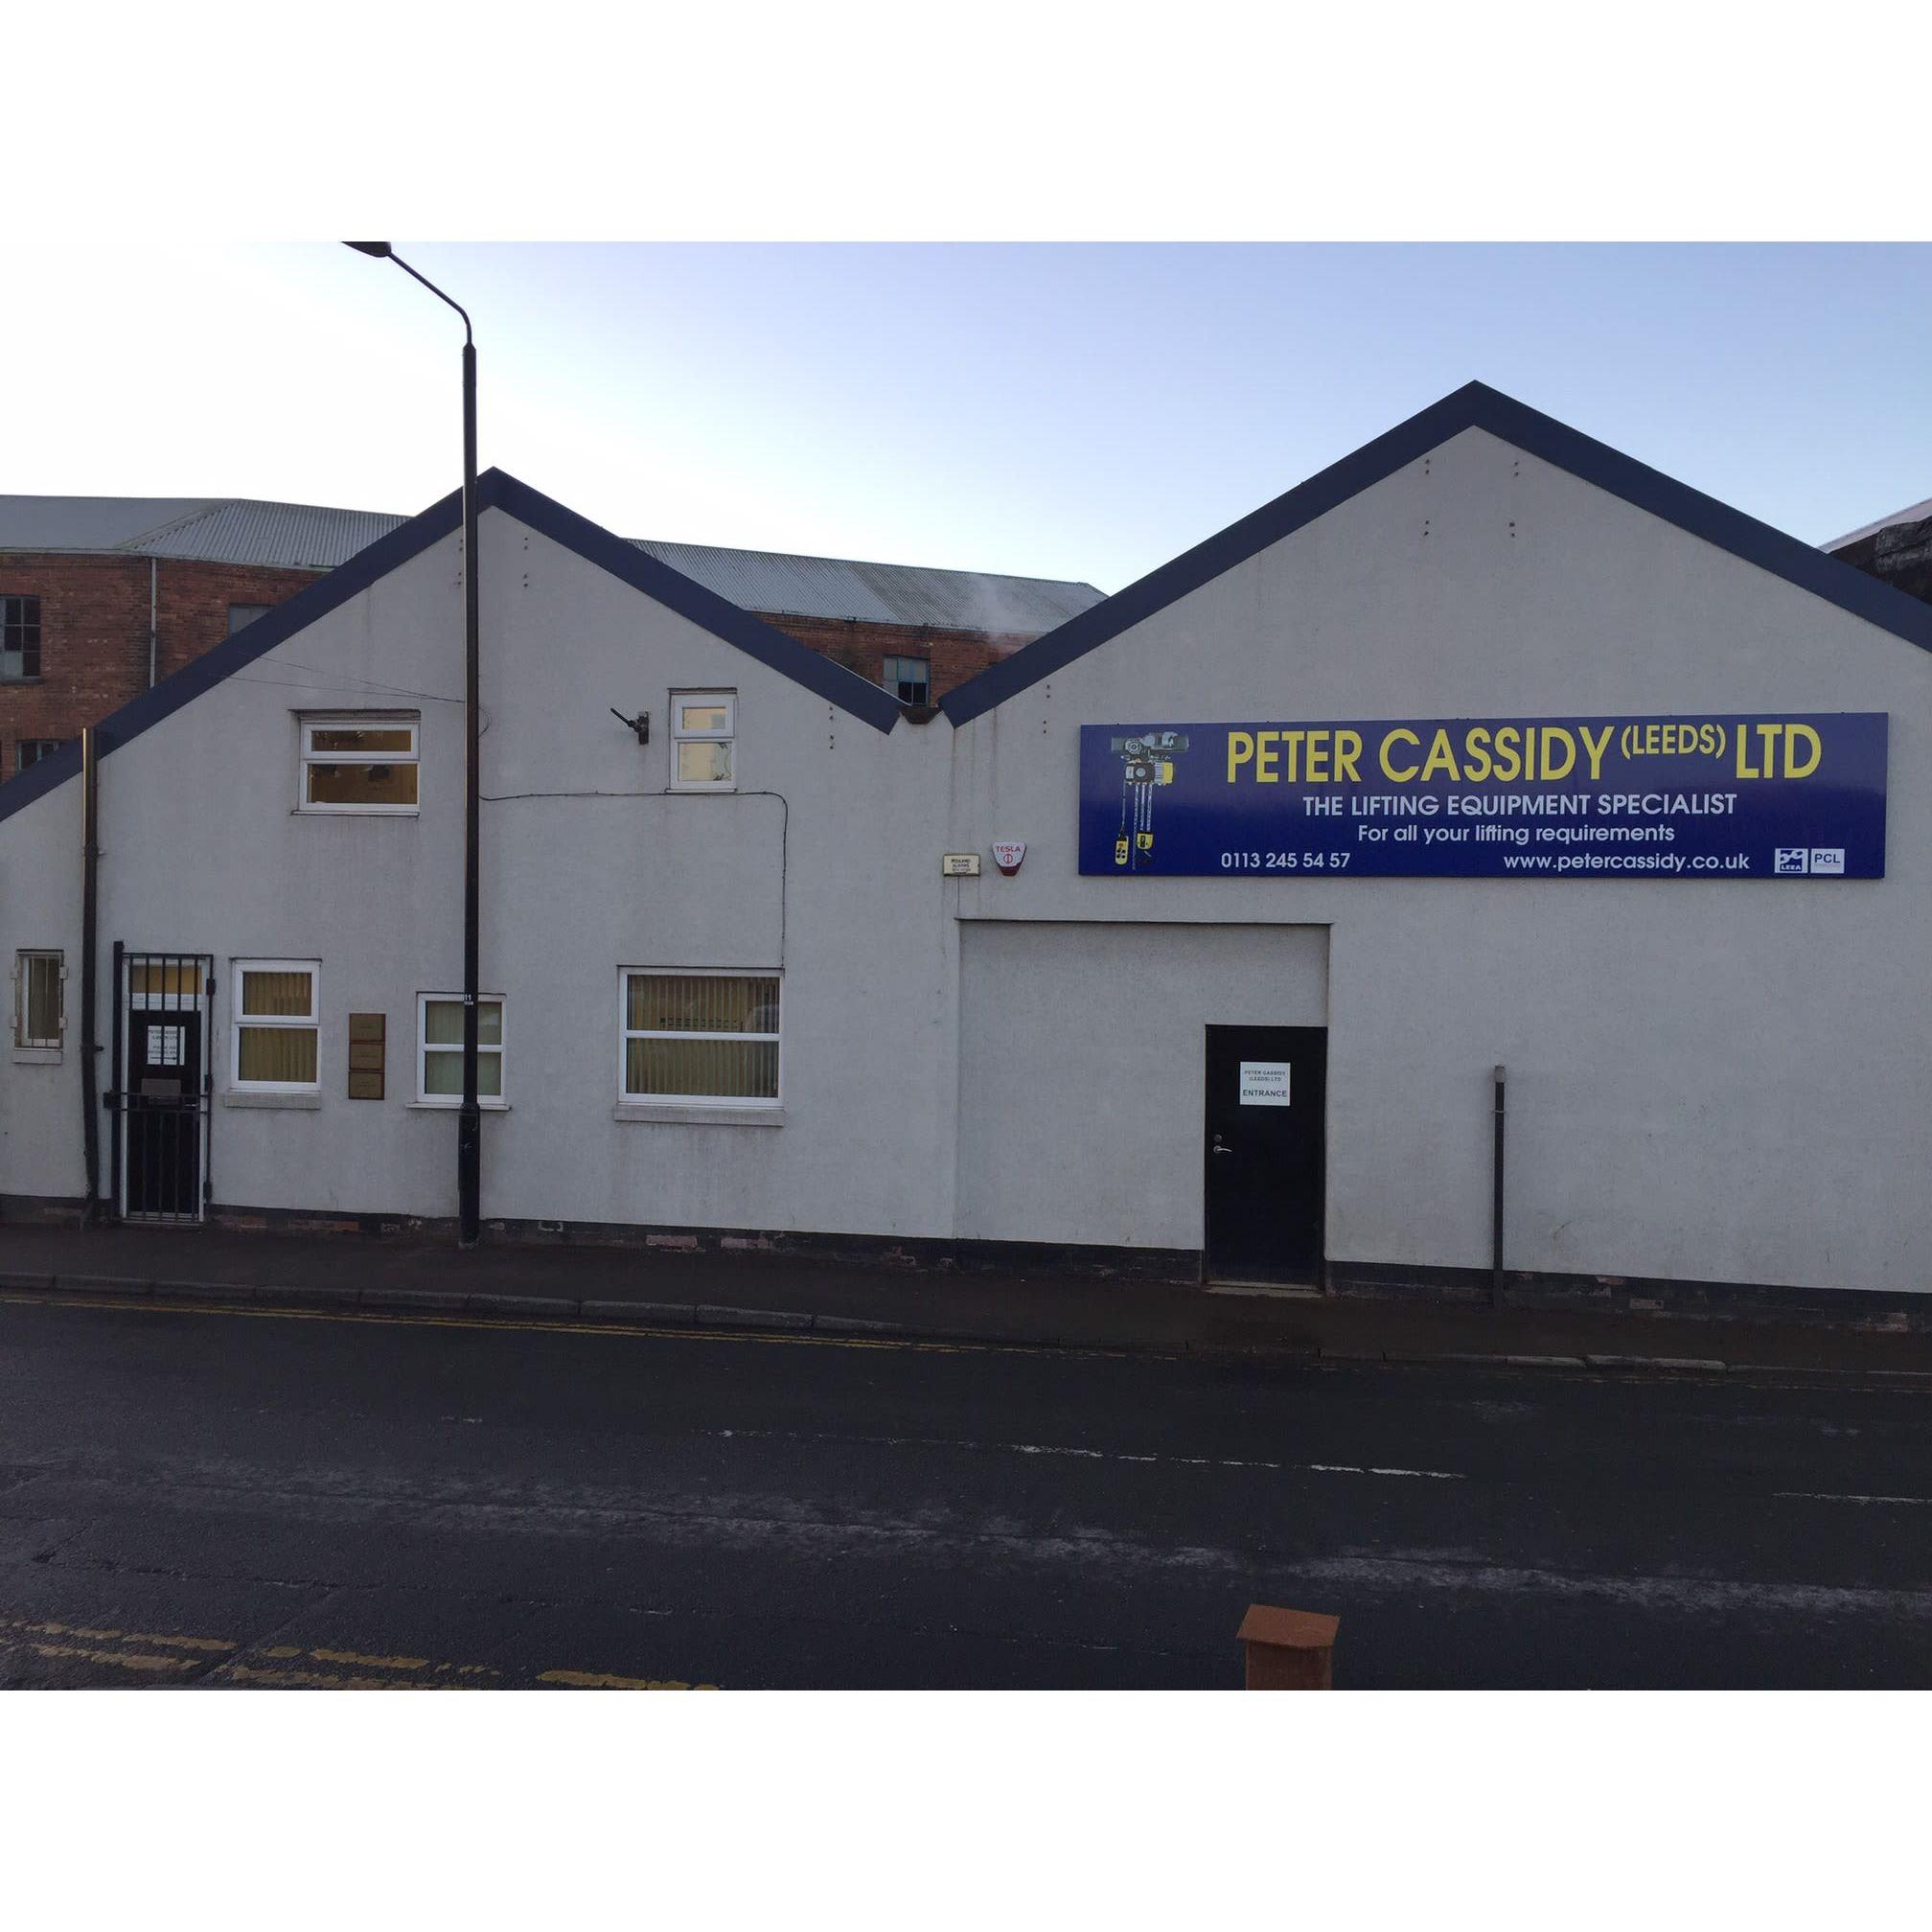 Peter Cassidy (Leeds) Ltd - Leeds, West Yorkshire LS11 9XA - 01132 455457 | ShowMeLocal.com